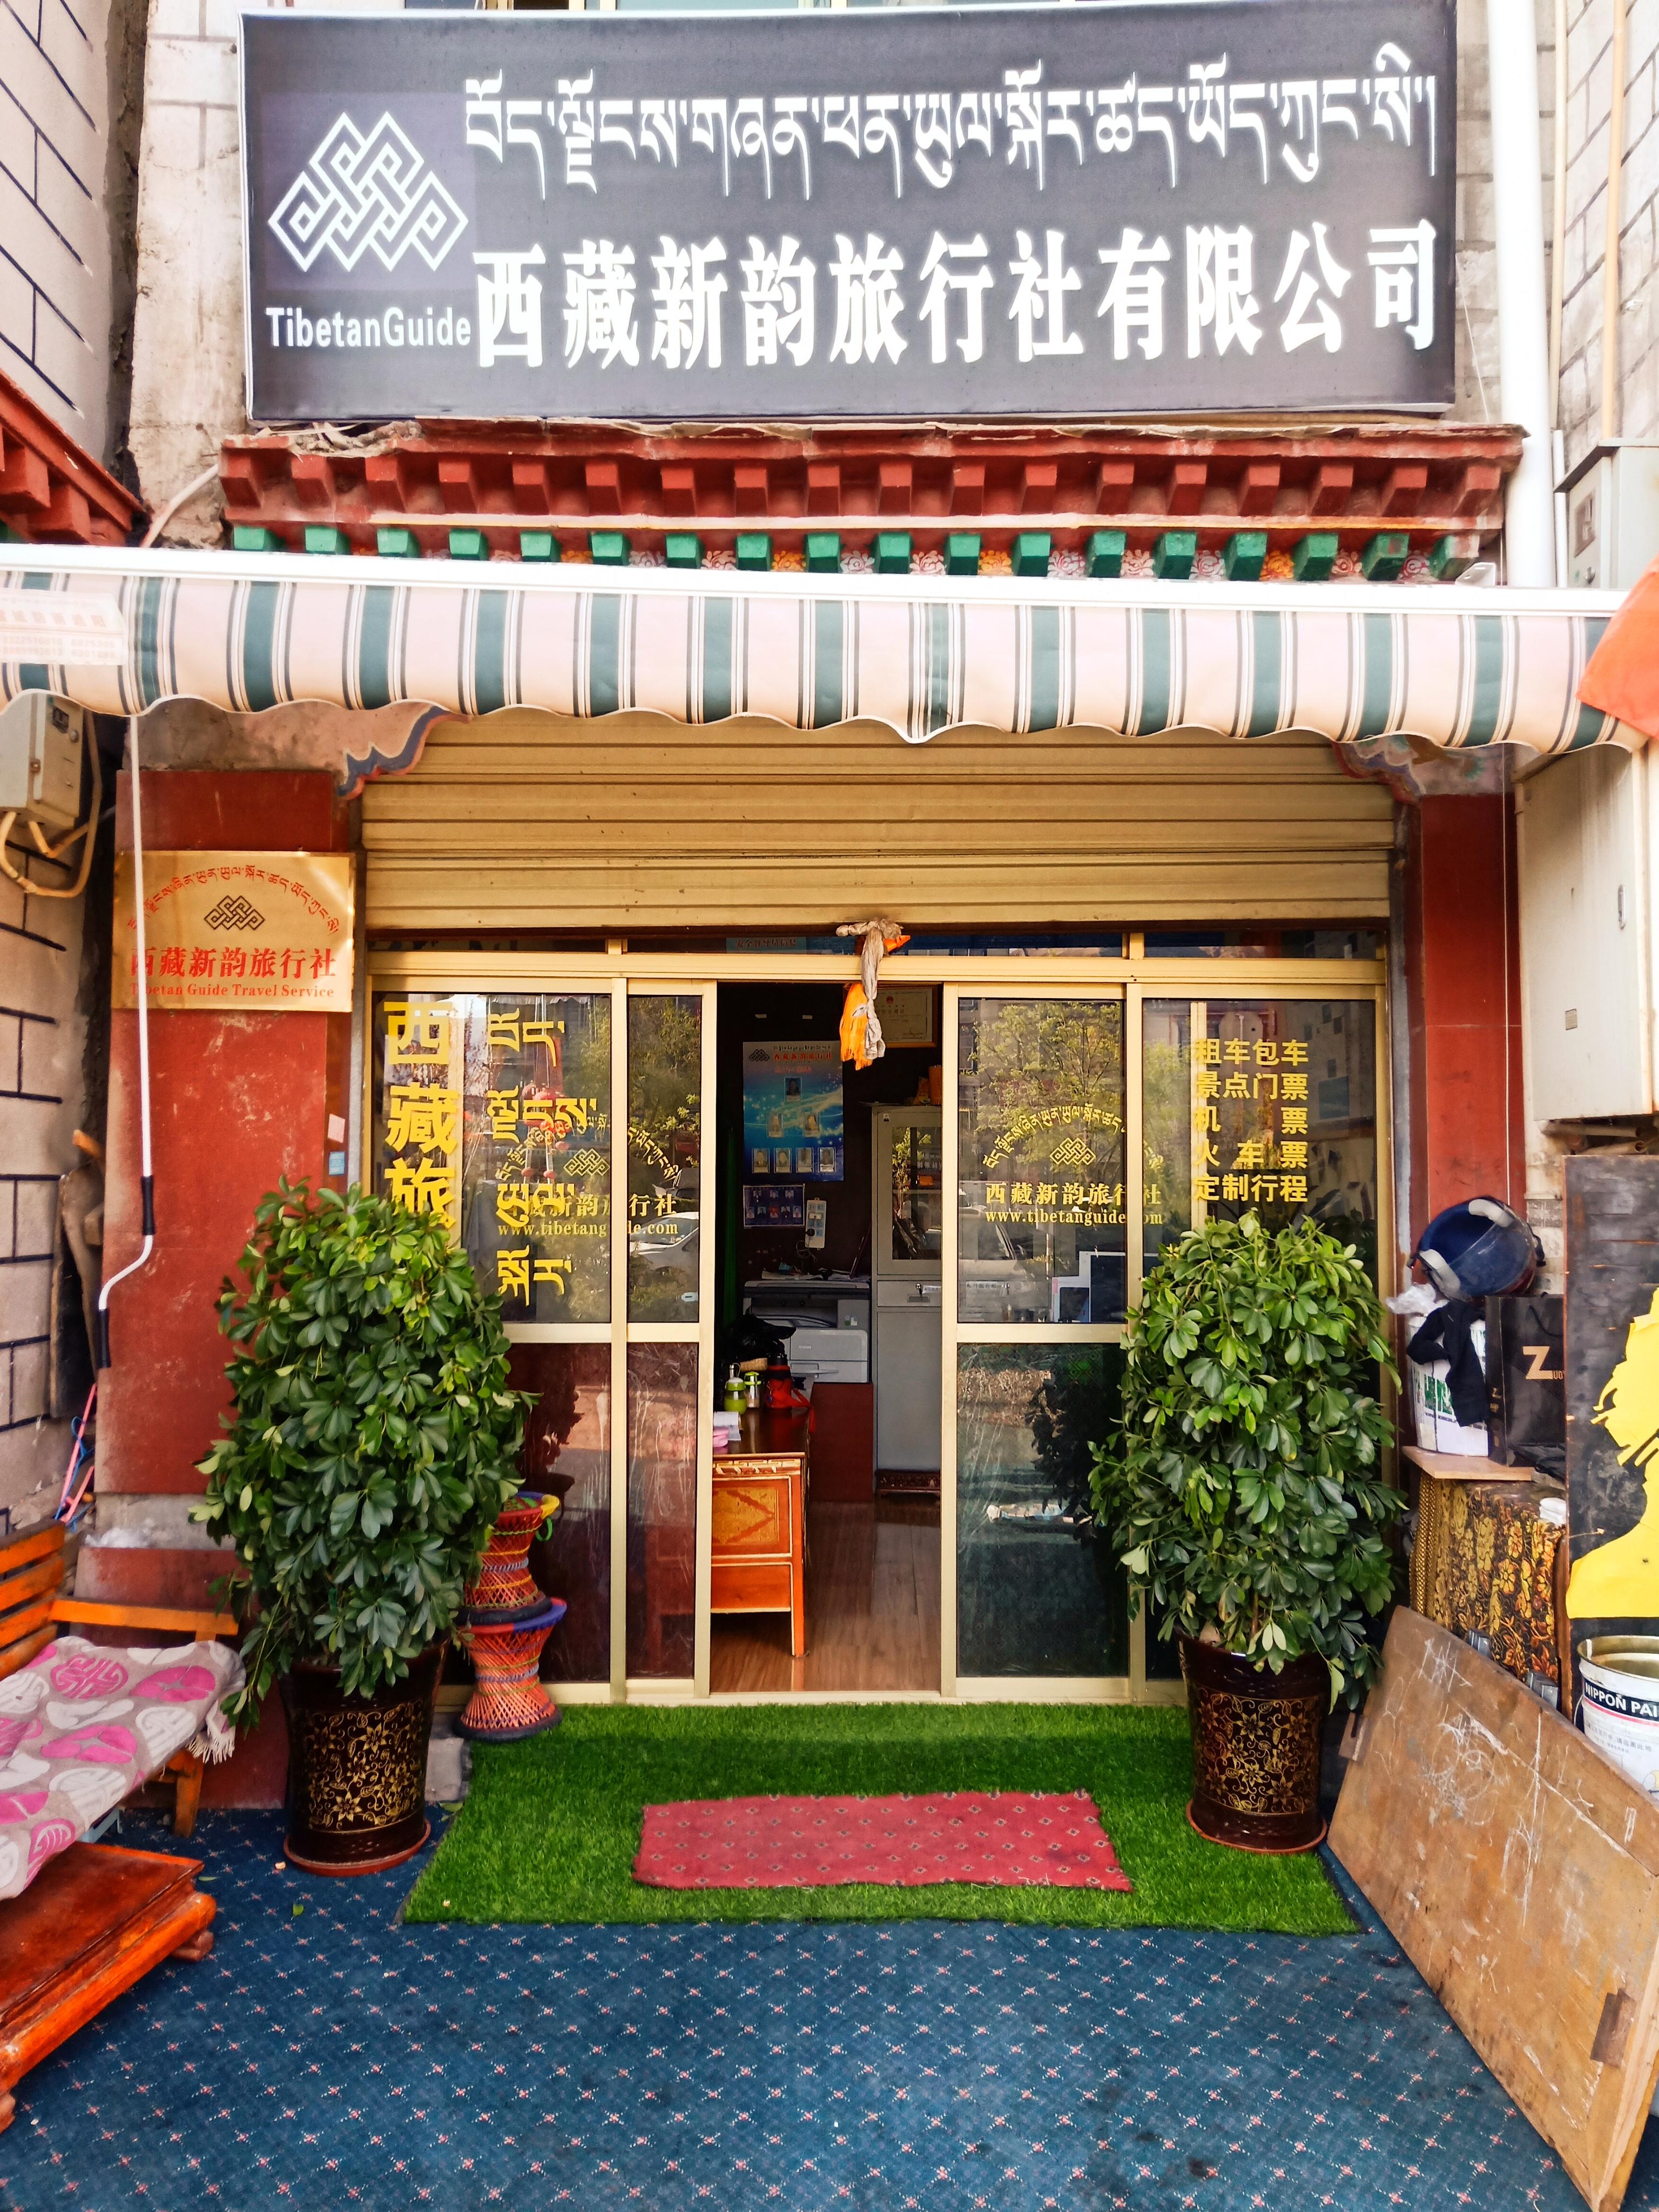 Tibetan guide office